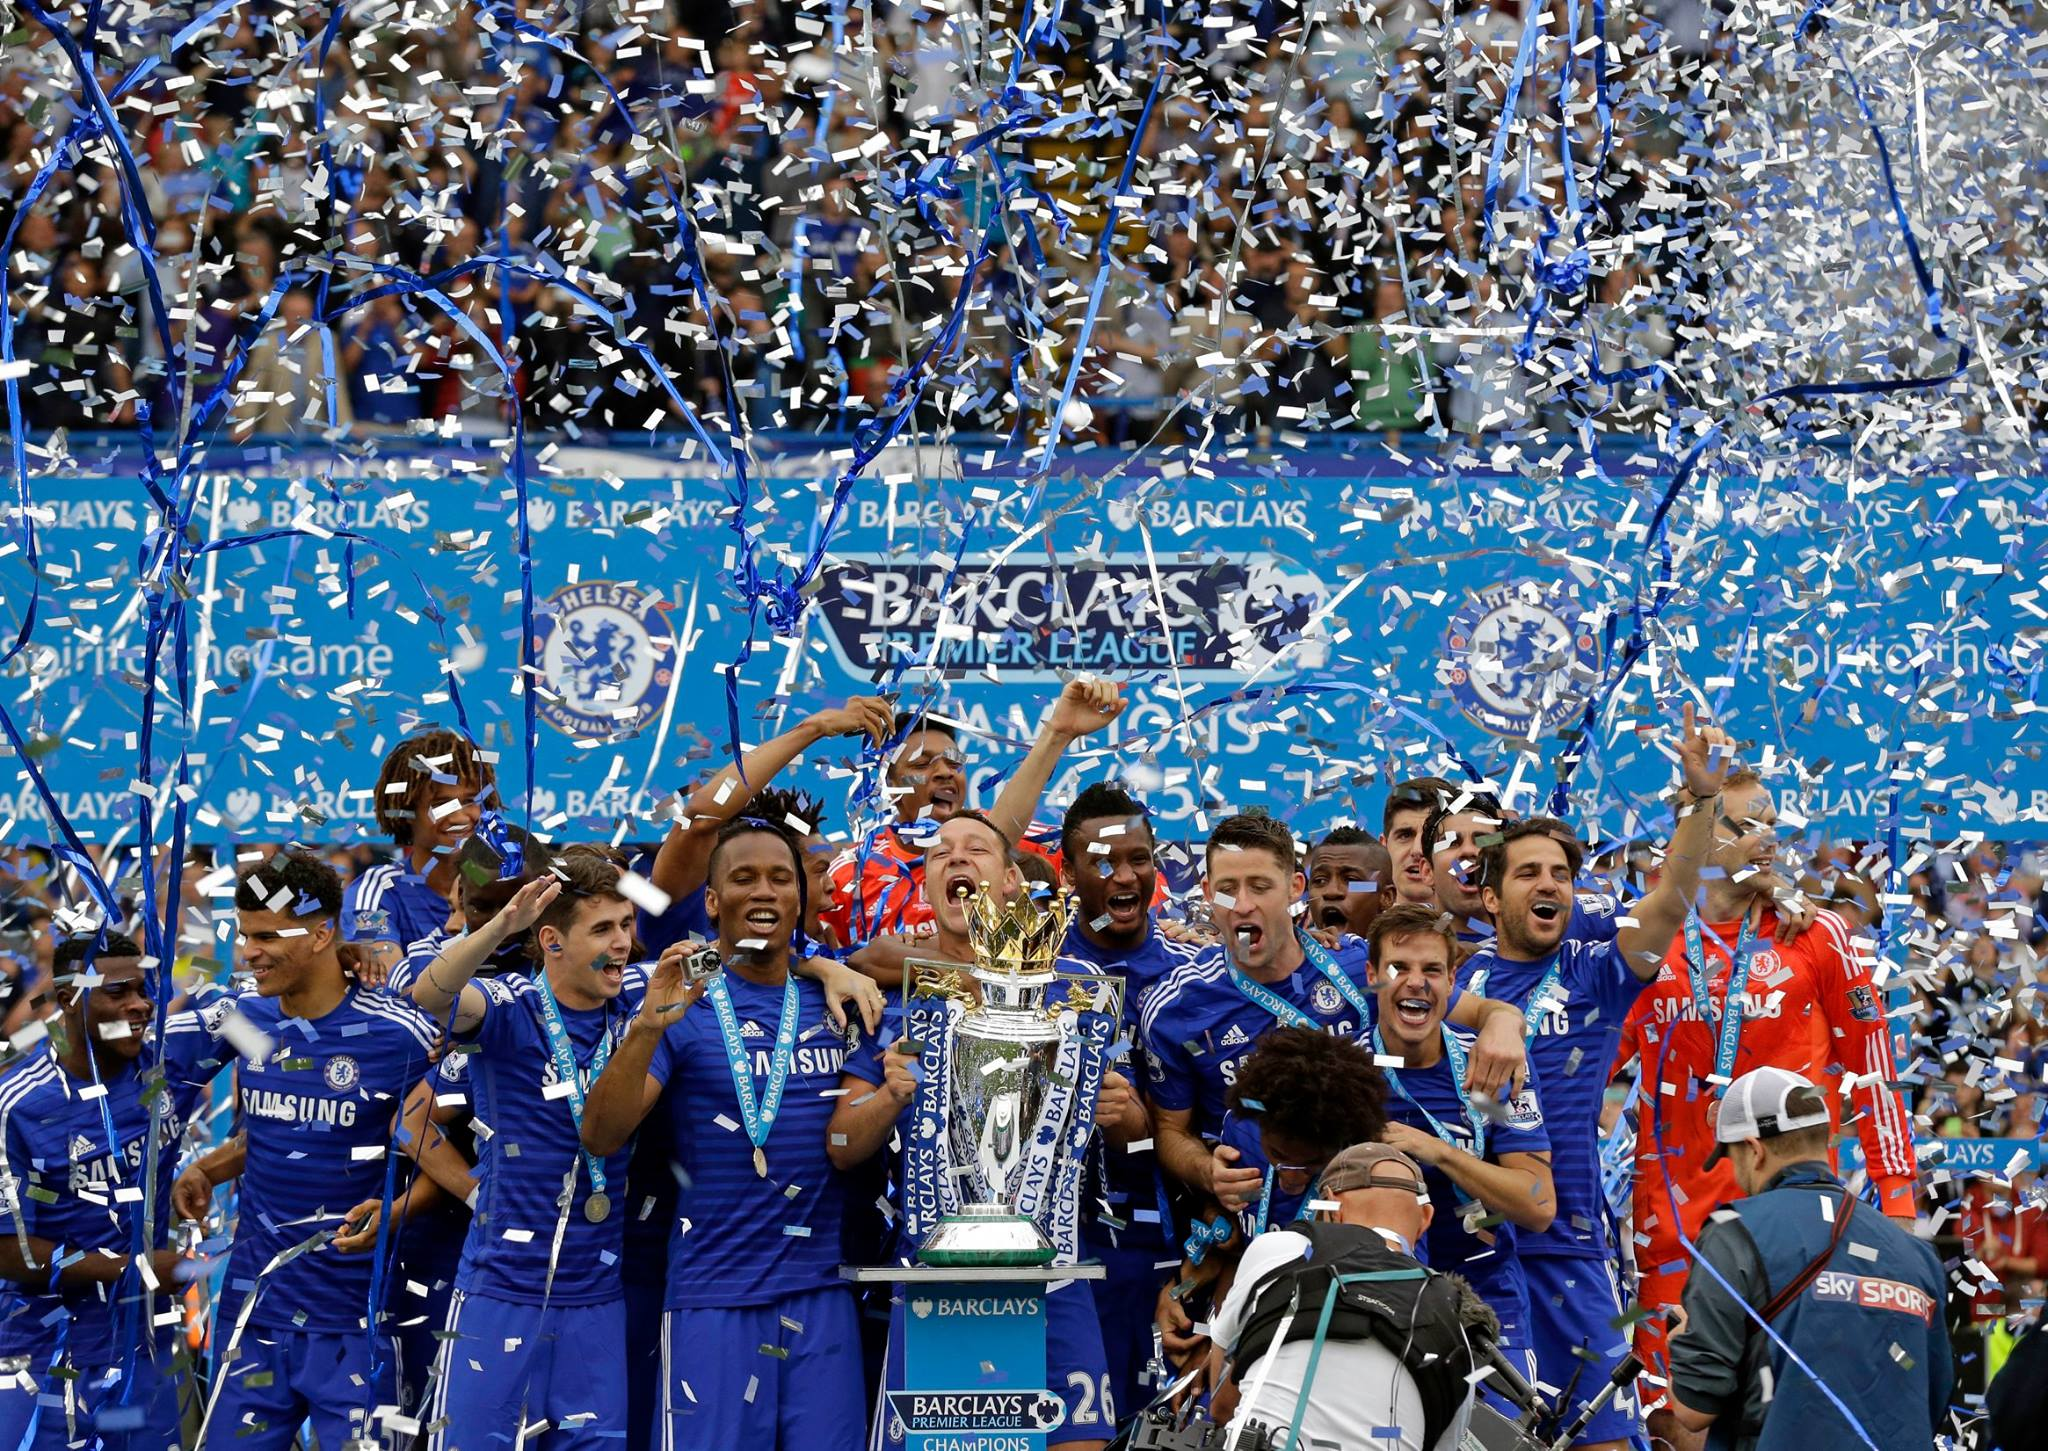 Chelsea FC - Champions of England by @ThomasLundbergP » Chelsea News